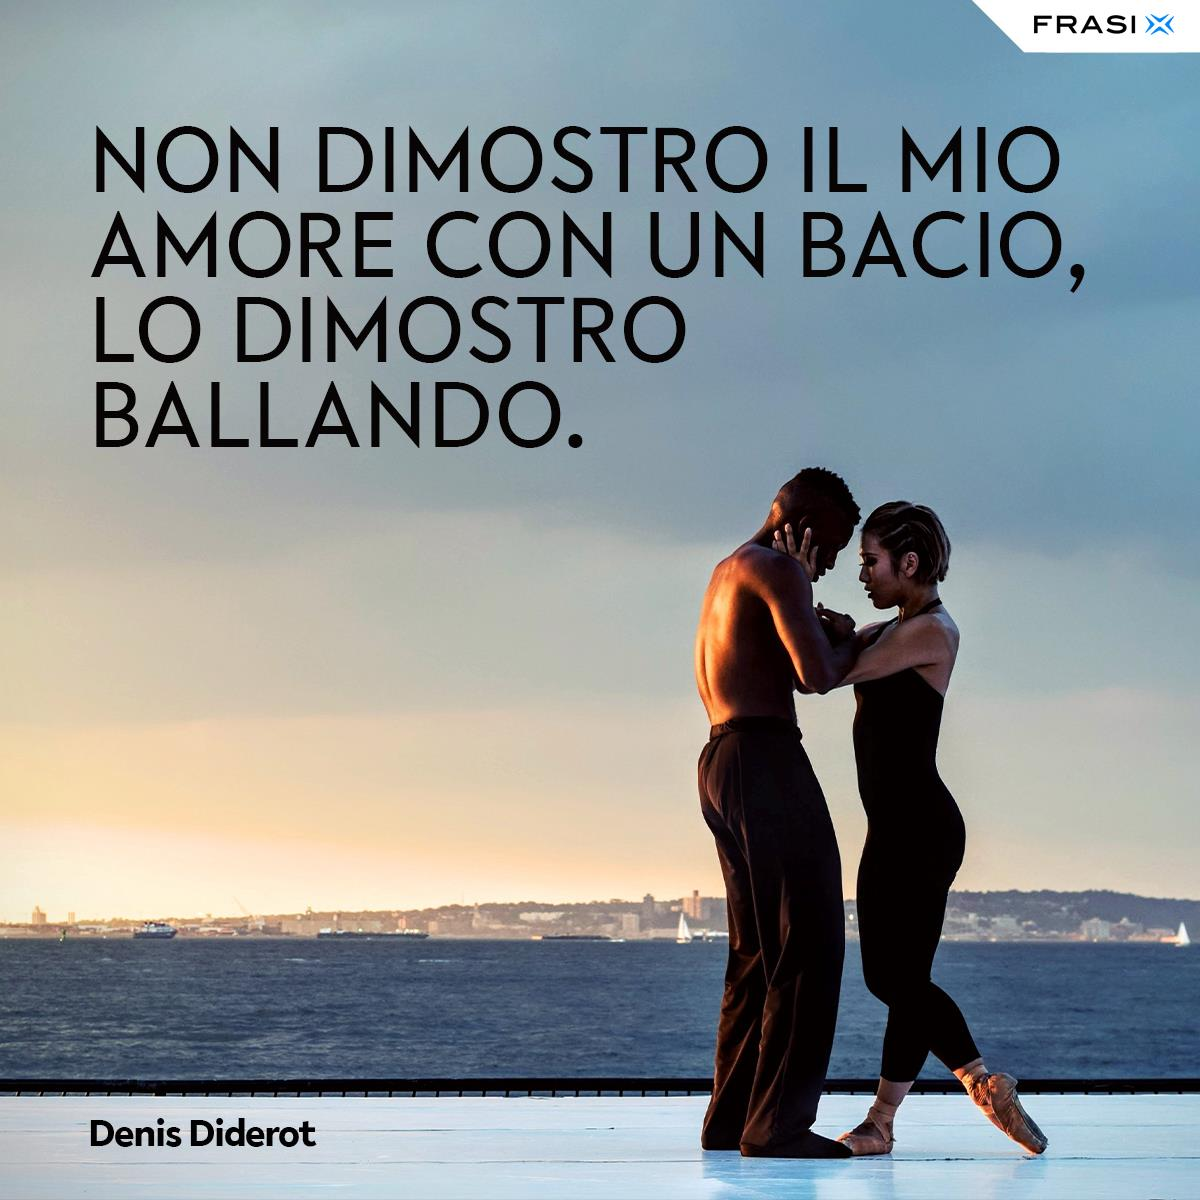 Frasi ballare e amore Diderot